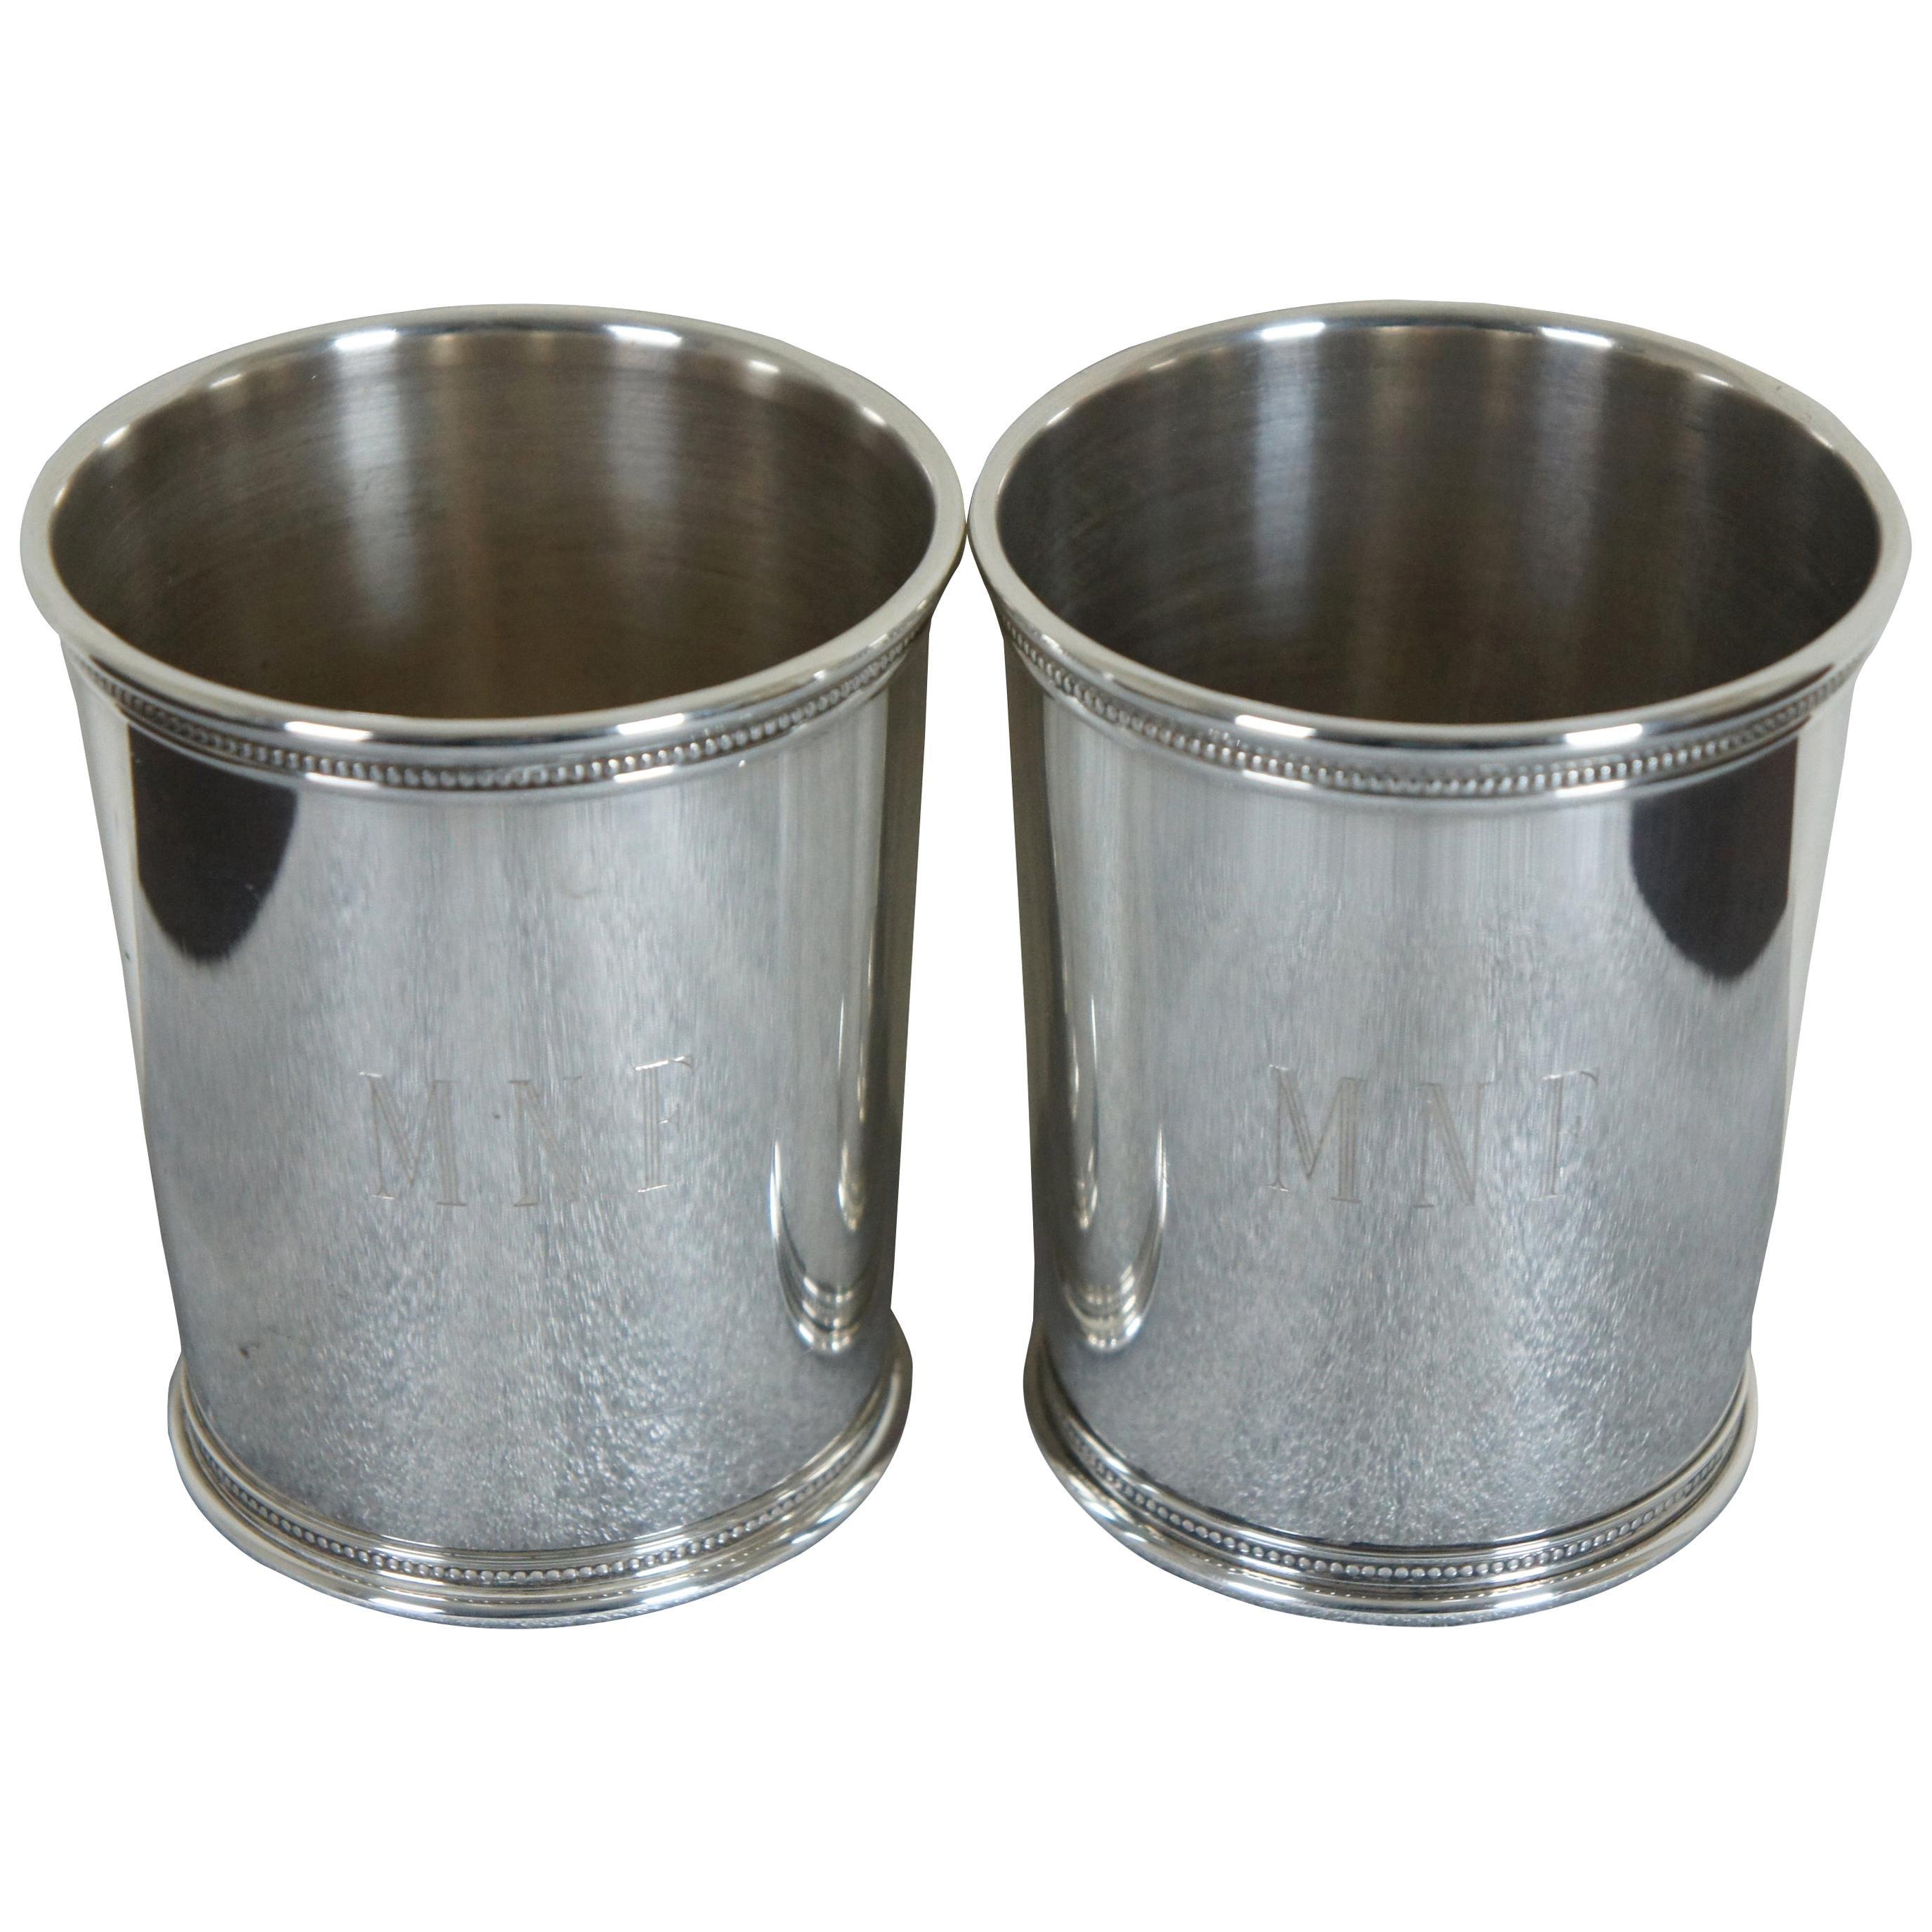 2 Sterling Silver Bill Clinton Presidential Mint Julep Cups Reed Barton WJC x253